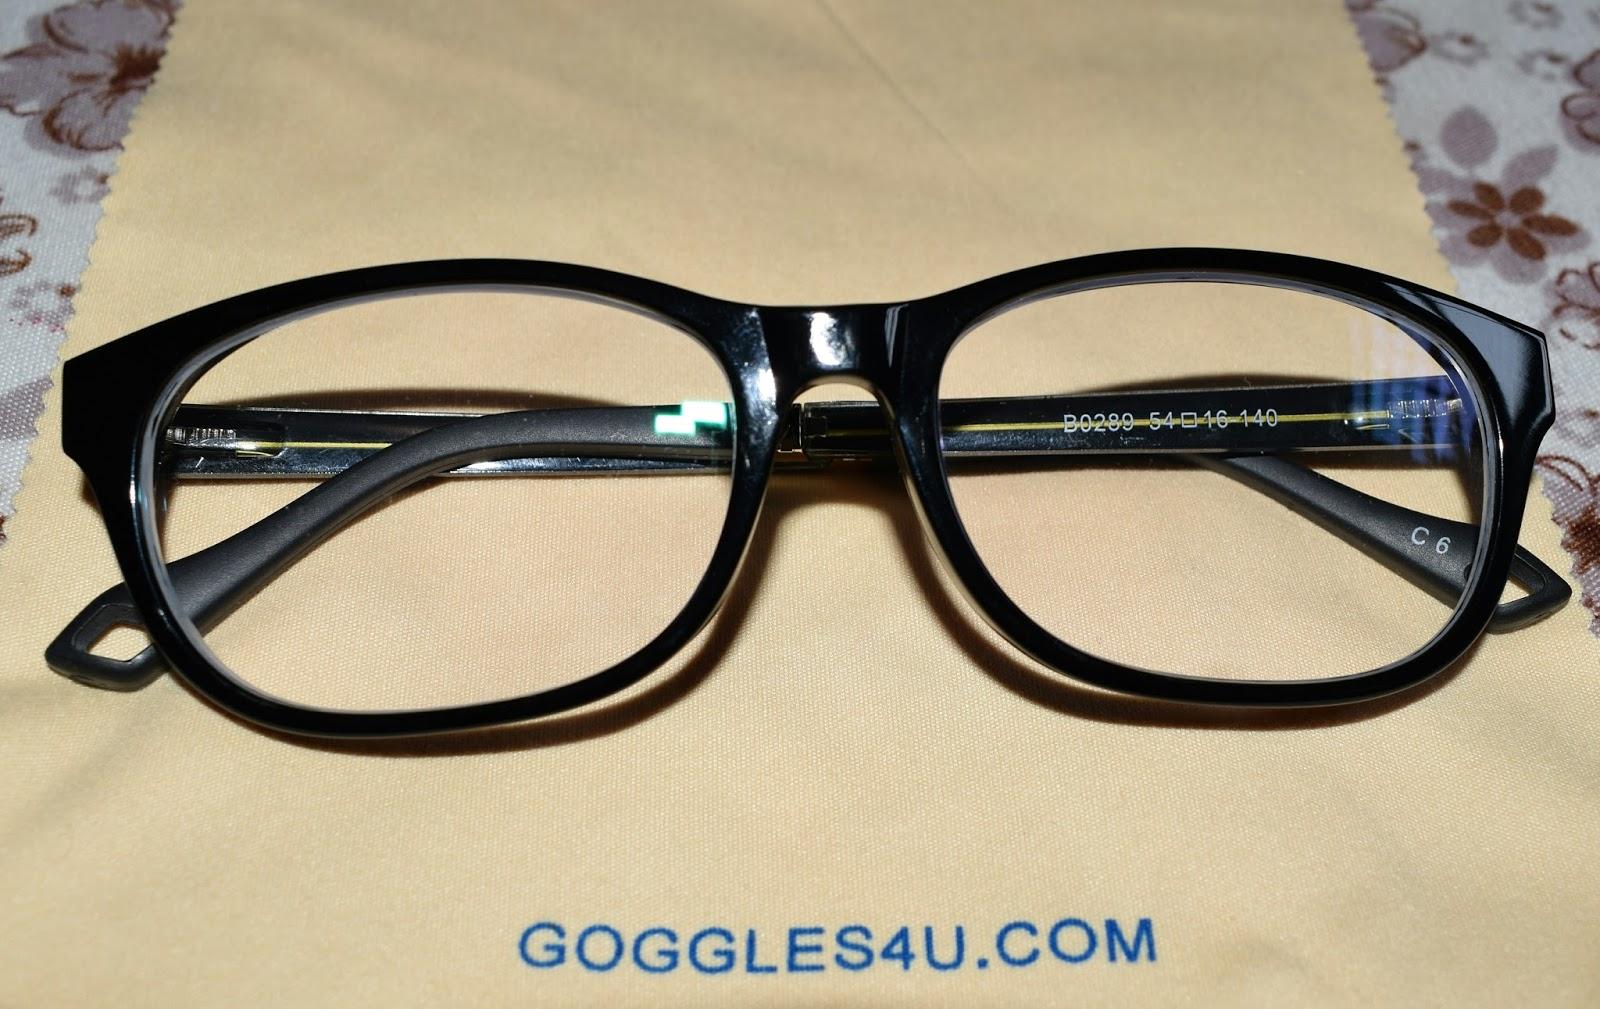 themysteriousgirl googles4u eyeglasses review bogo offer